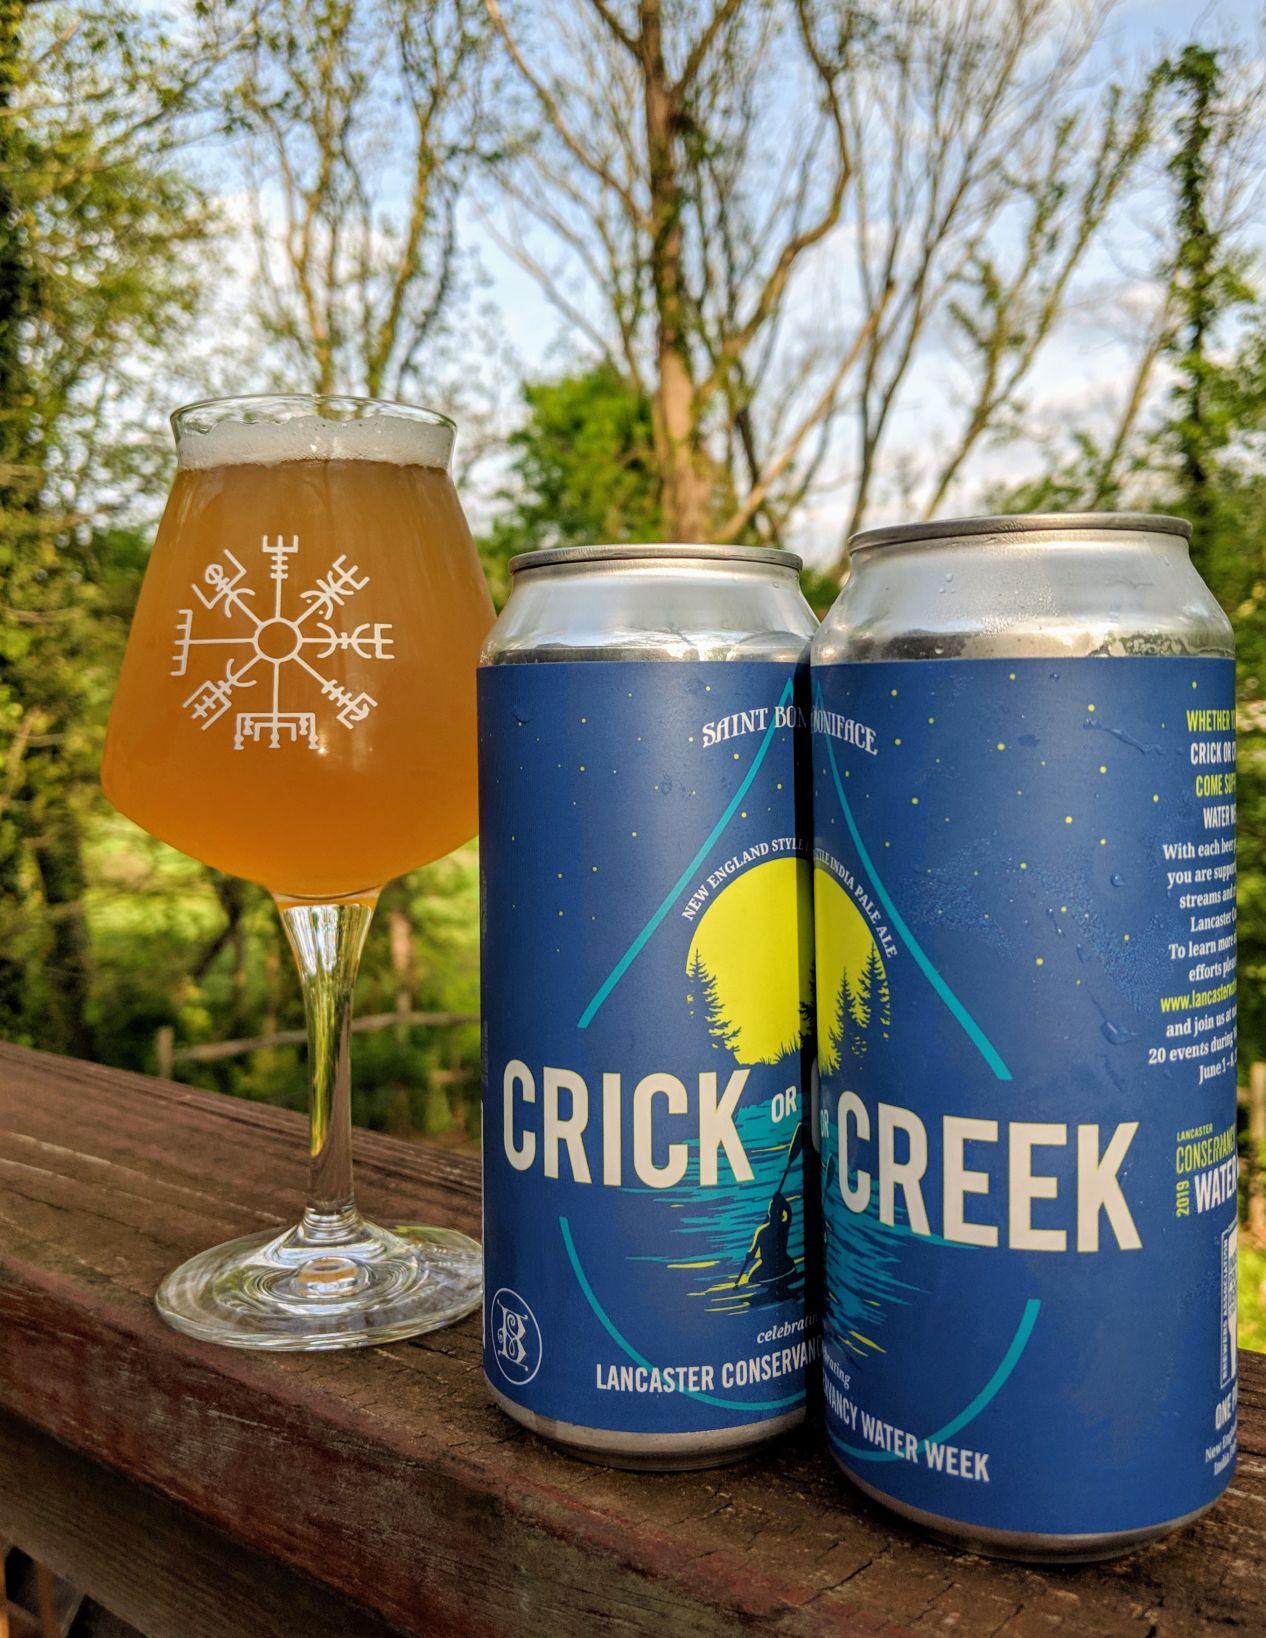 St. Boniface Craft Brewing Co. Crick or Creek